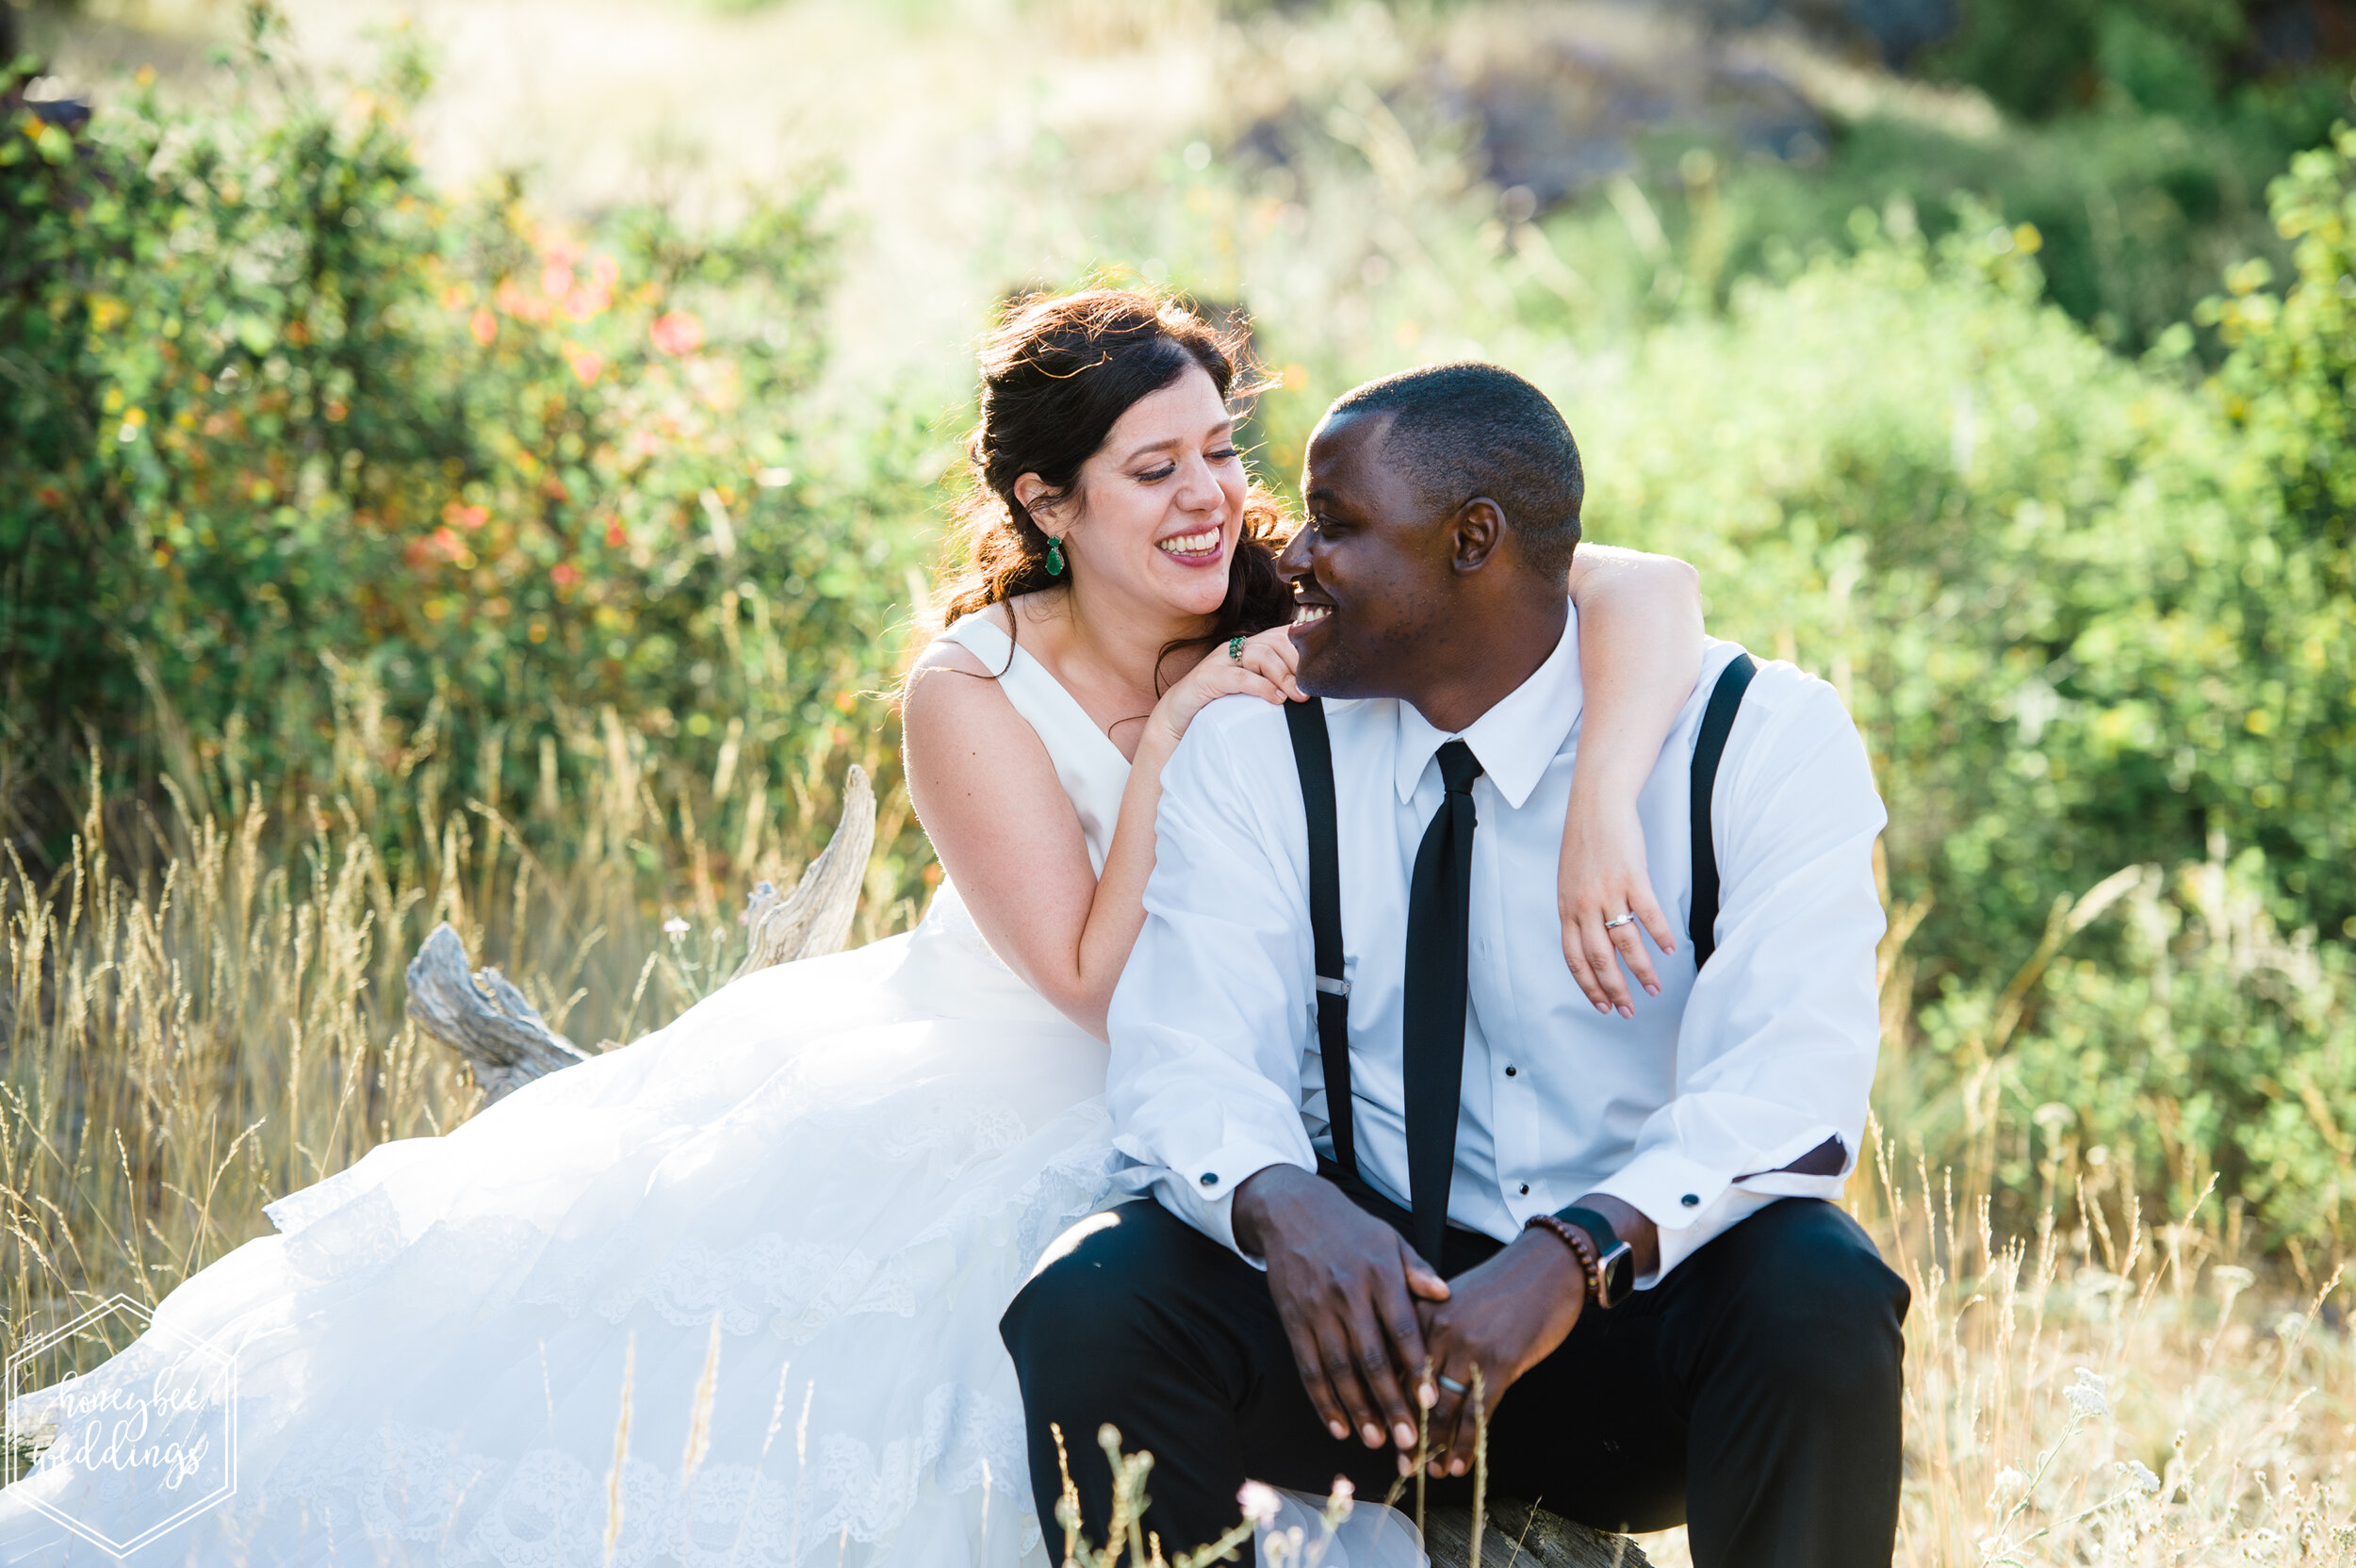 171White Raven Wedding_Montana Wedding Photographer_Rebekah & Likom_Honeybee Weddings_July 27, 2019-427.jpg